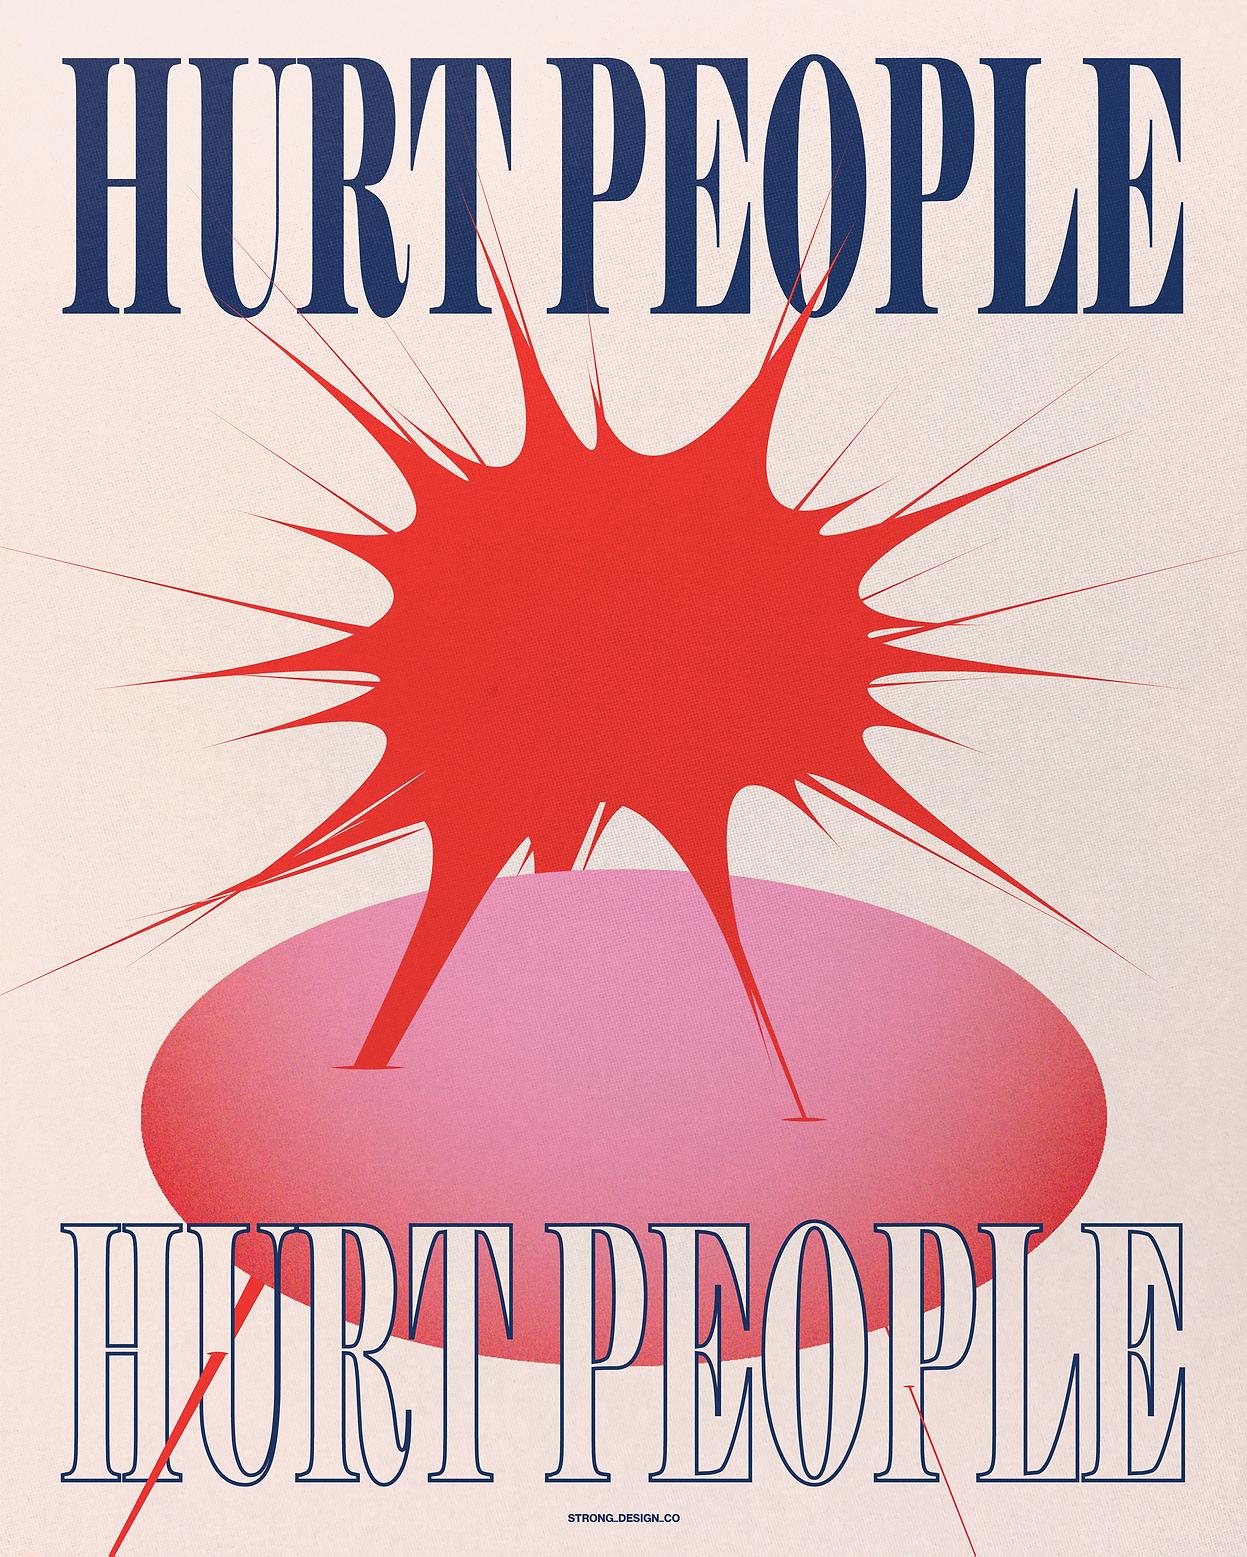 hurt-people-hurt-2.png